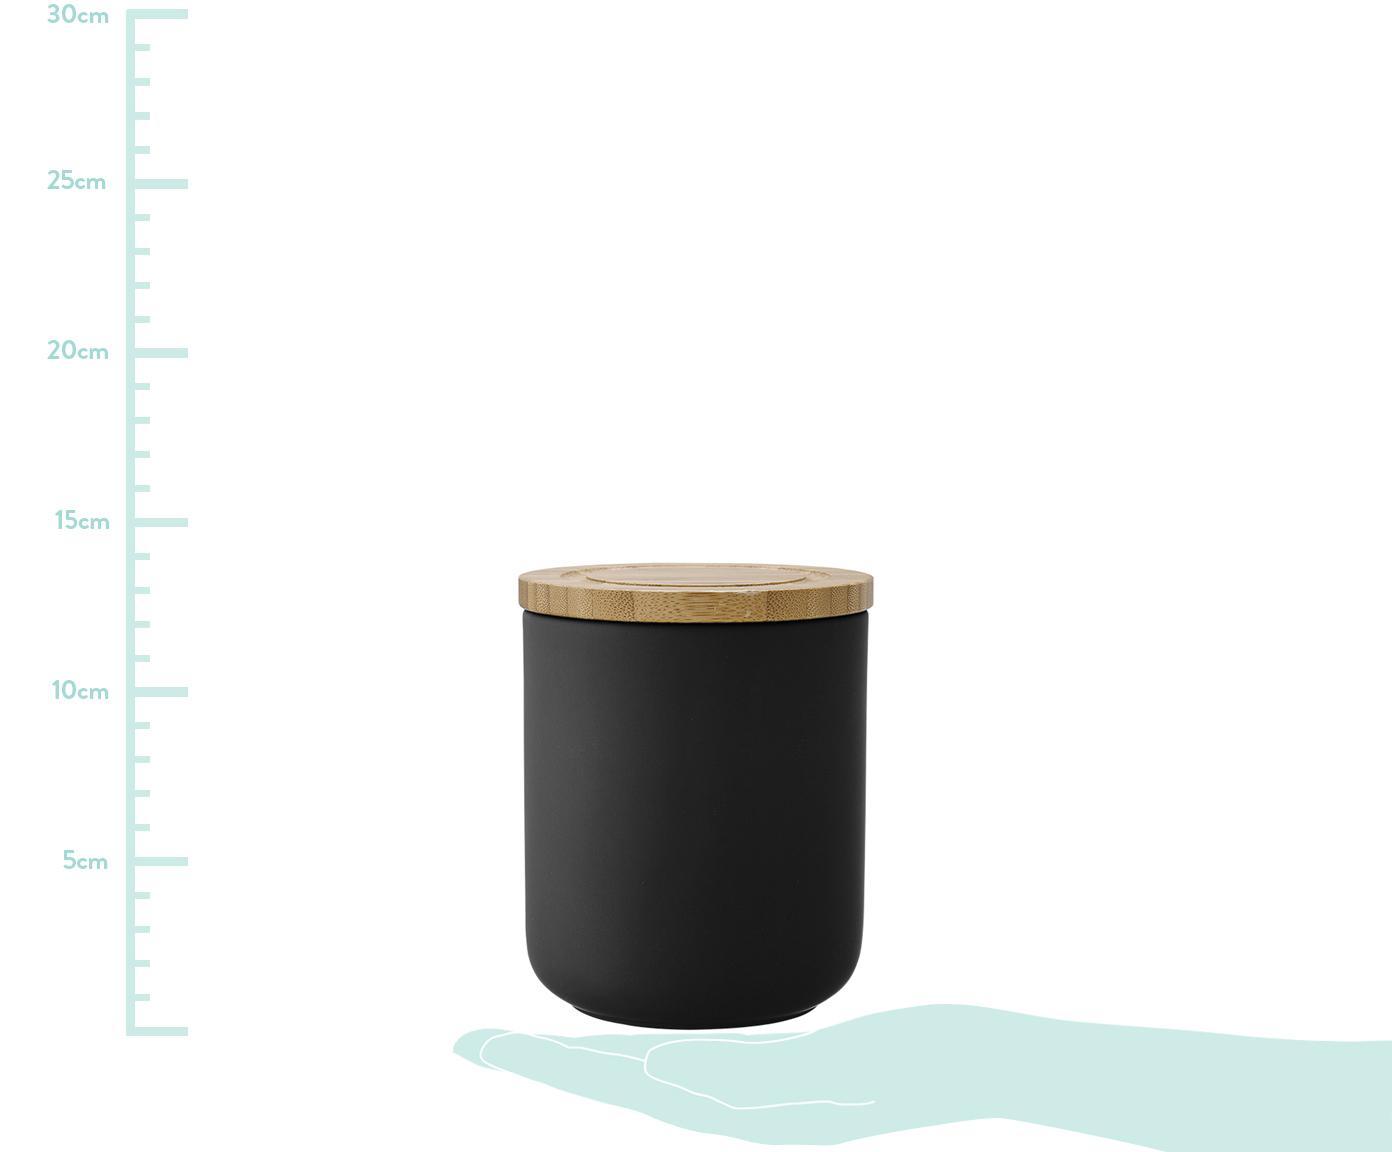 Aufbewahrungsdose Stak, Dose: Keramik, Deckel: Bambusholz, Schwarz, Bambus, Ø 10 x H 17 cm